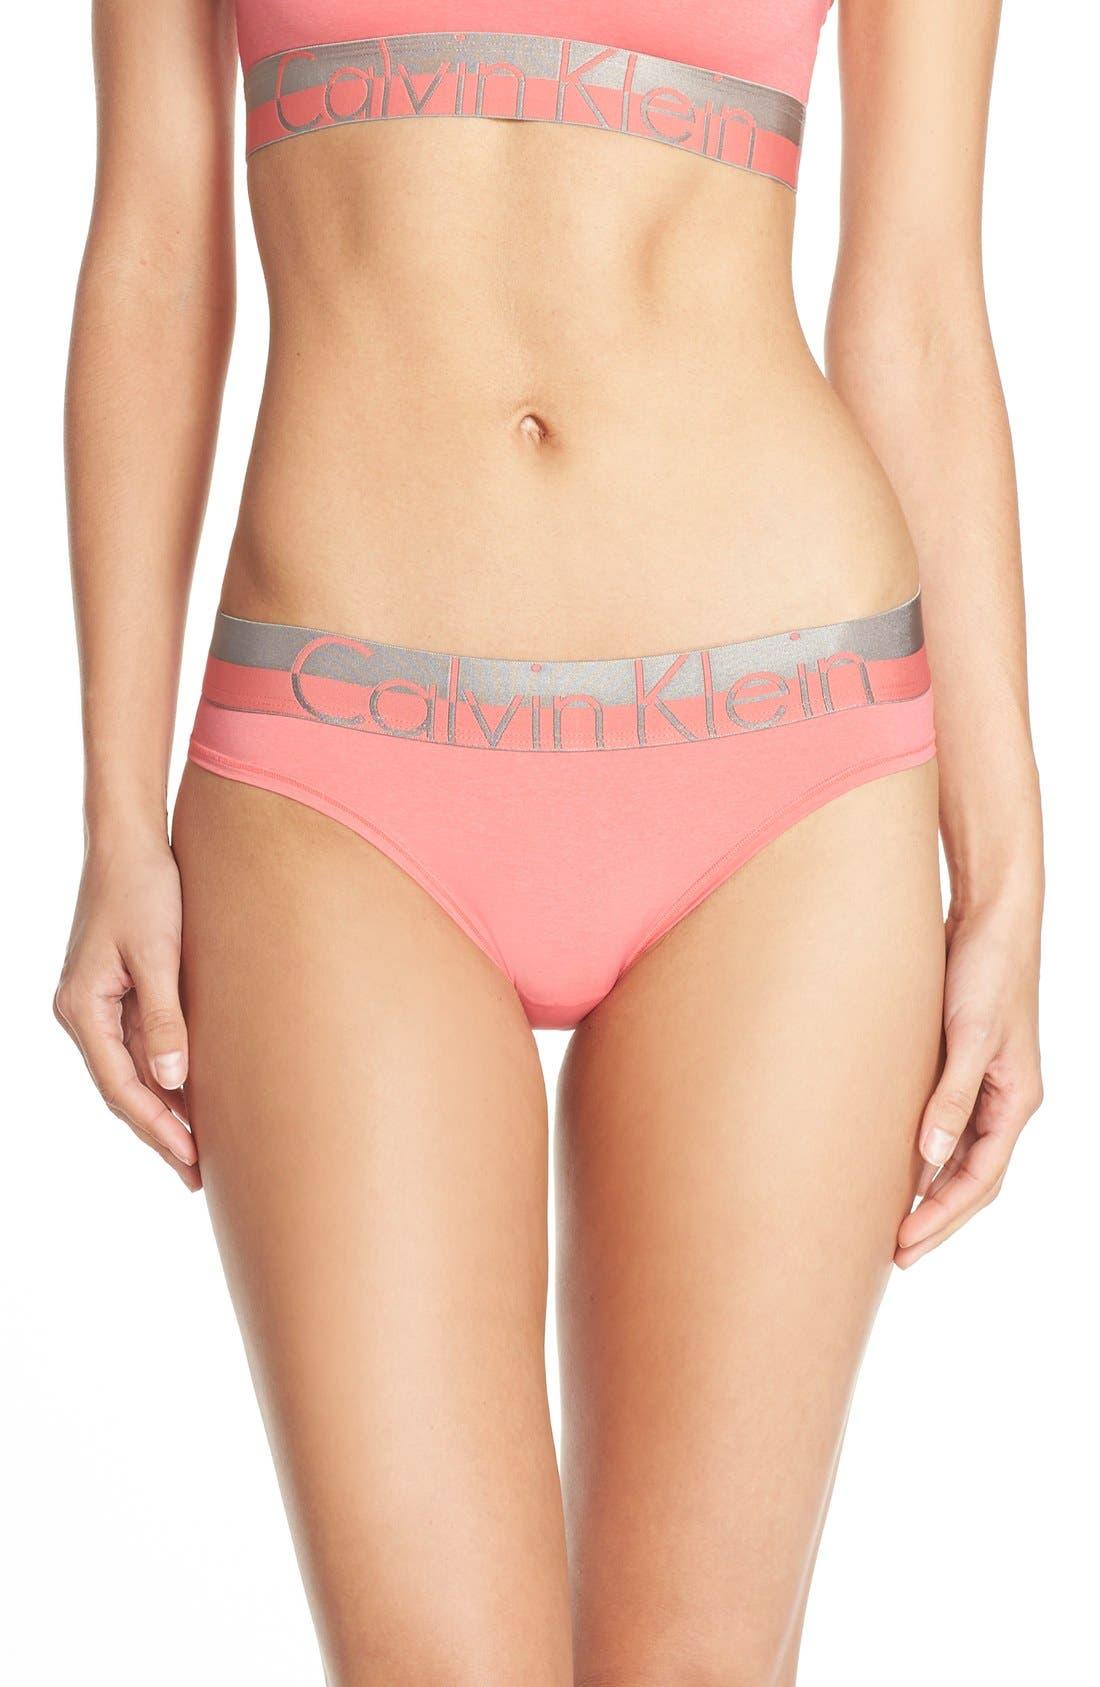 Alternate Image 1 Selected - Calvin Klein 'Magnetic Force' Microfiber Bikini Briefs